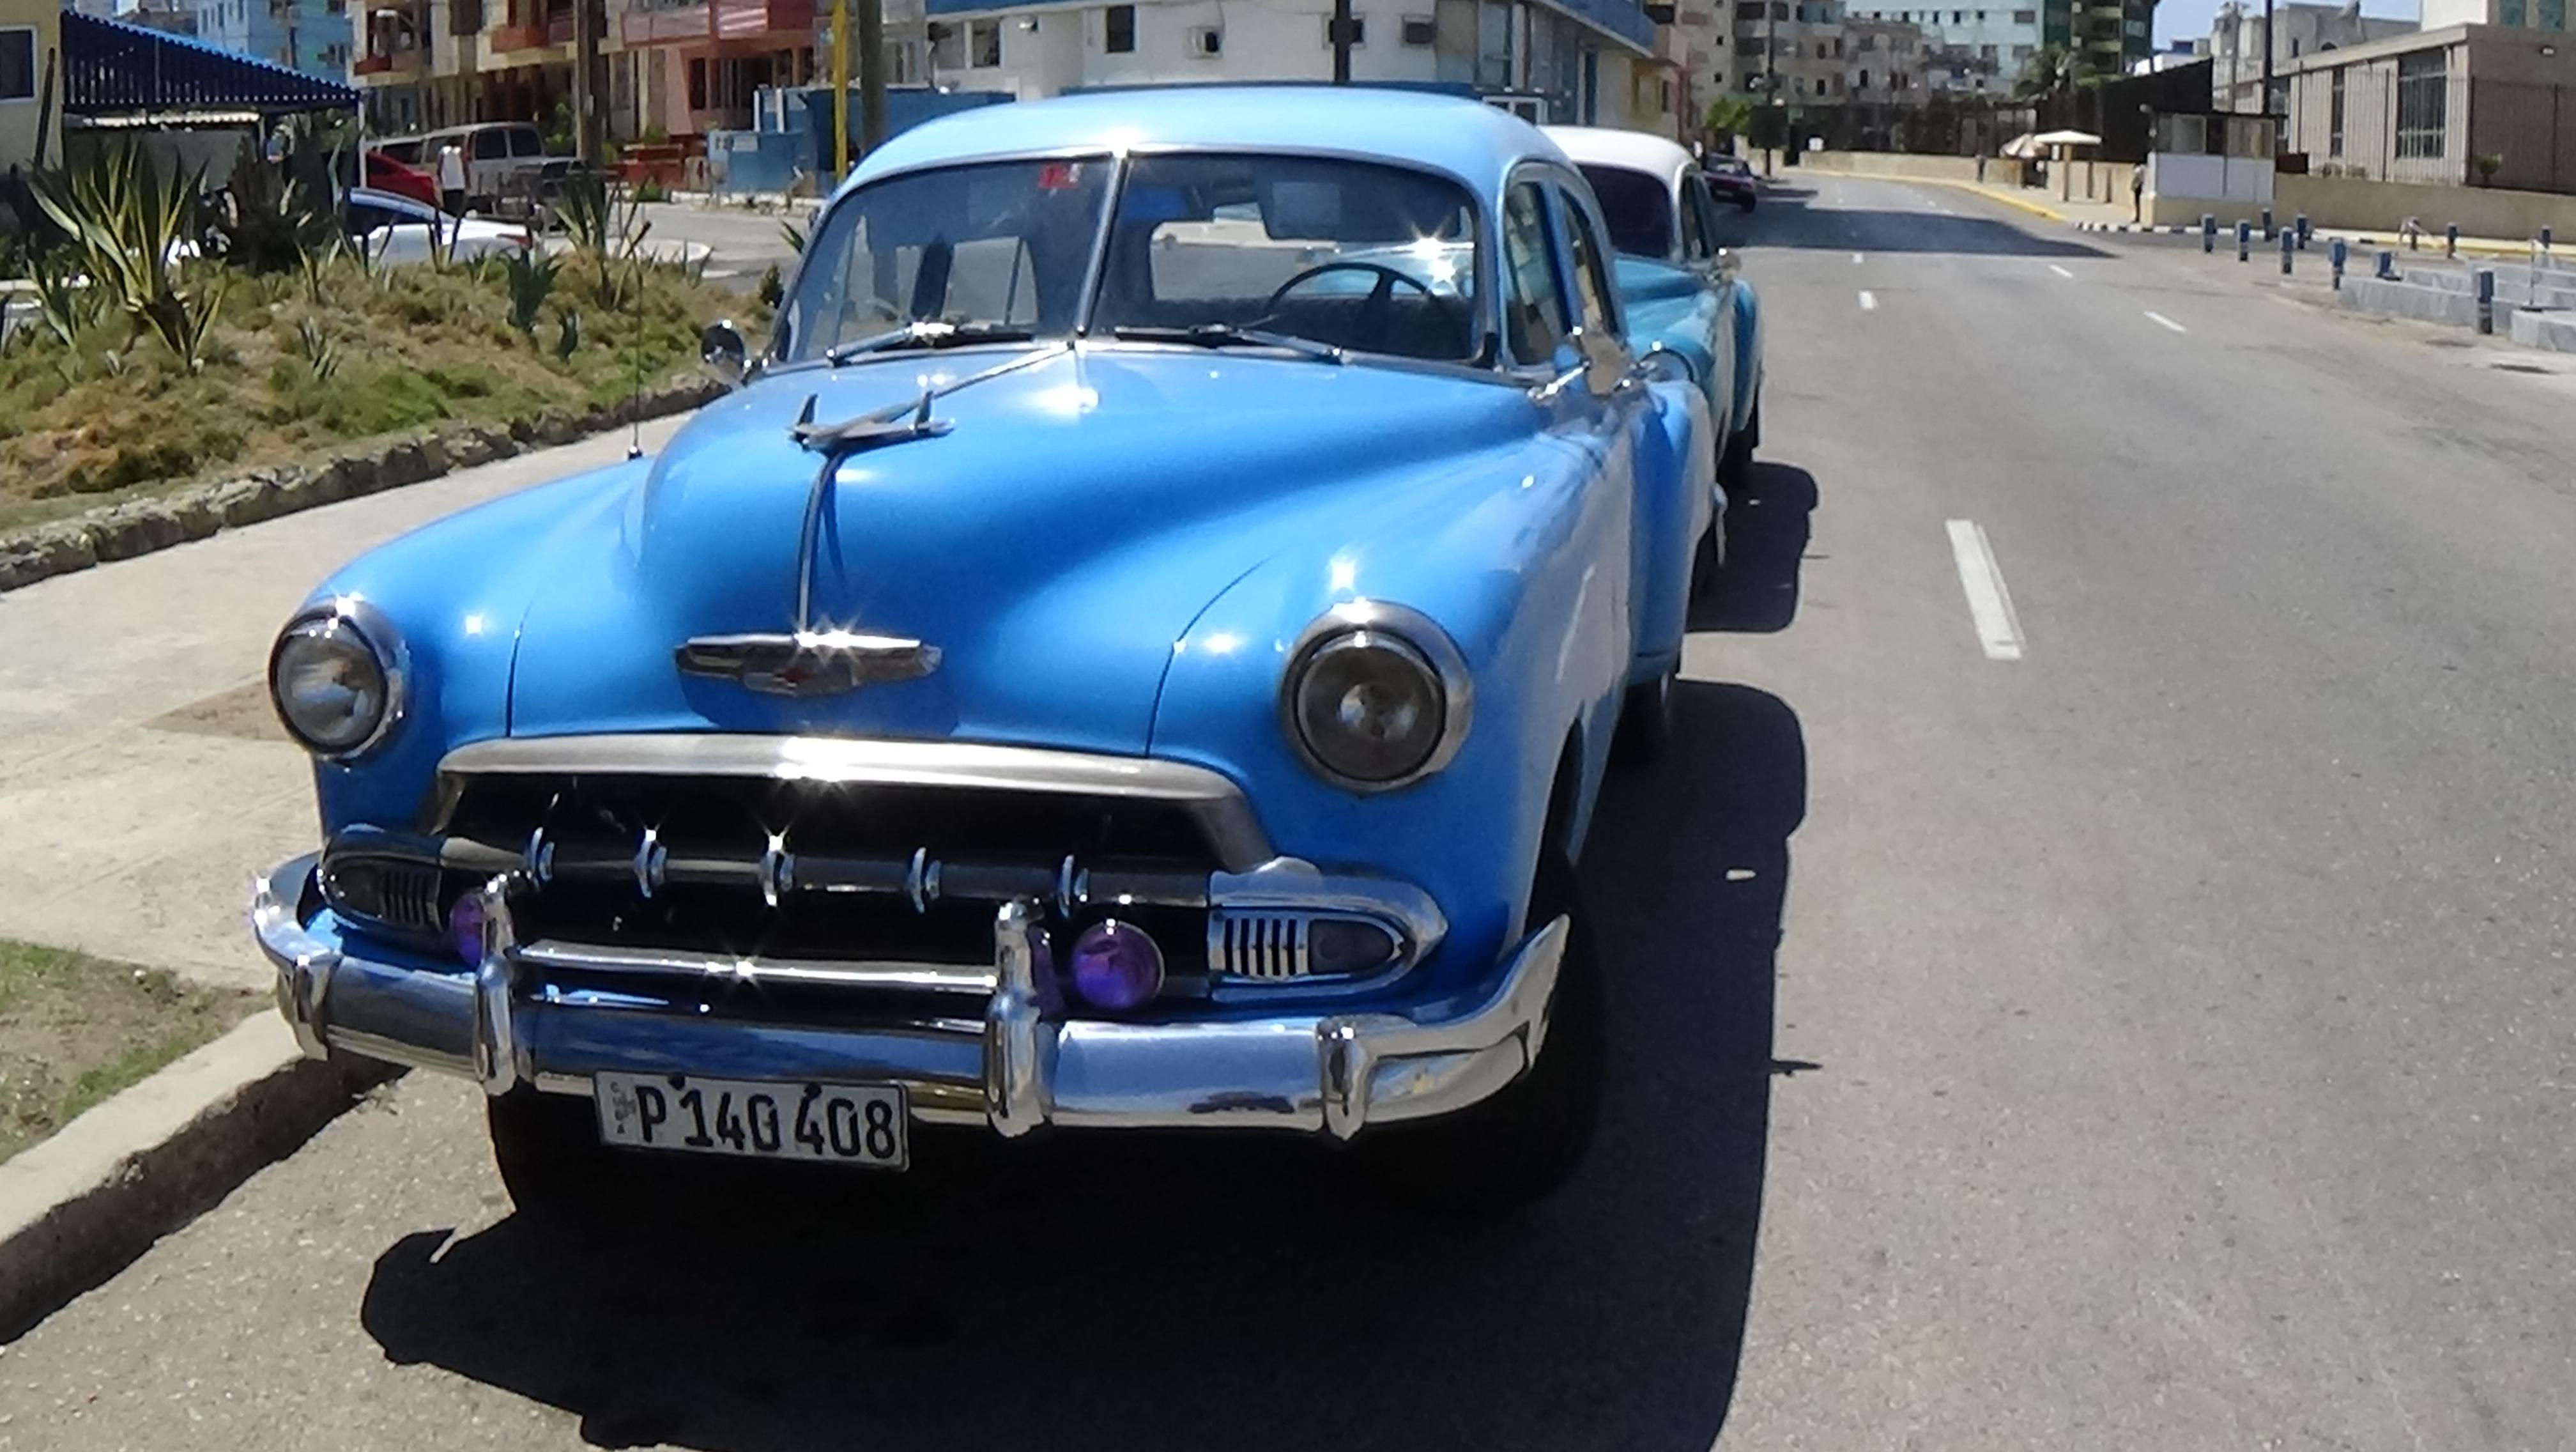 Free Images : motor vehicle, vintage car, cuba, sedan, chevrolet ...